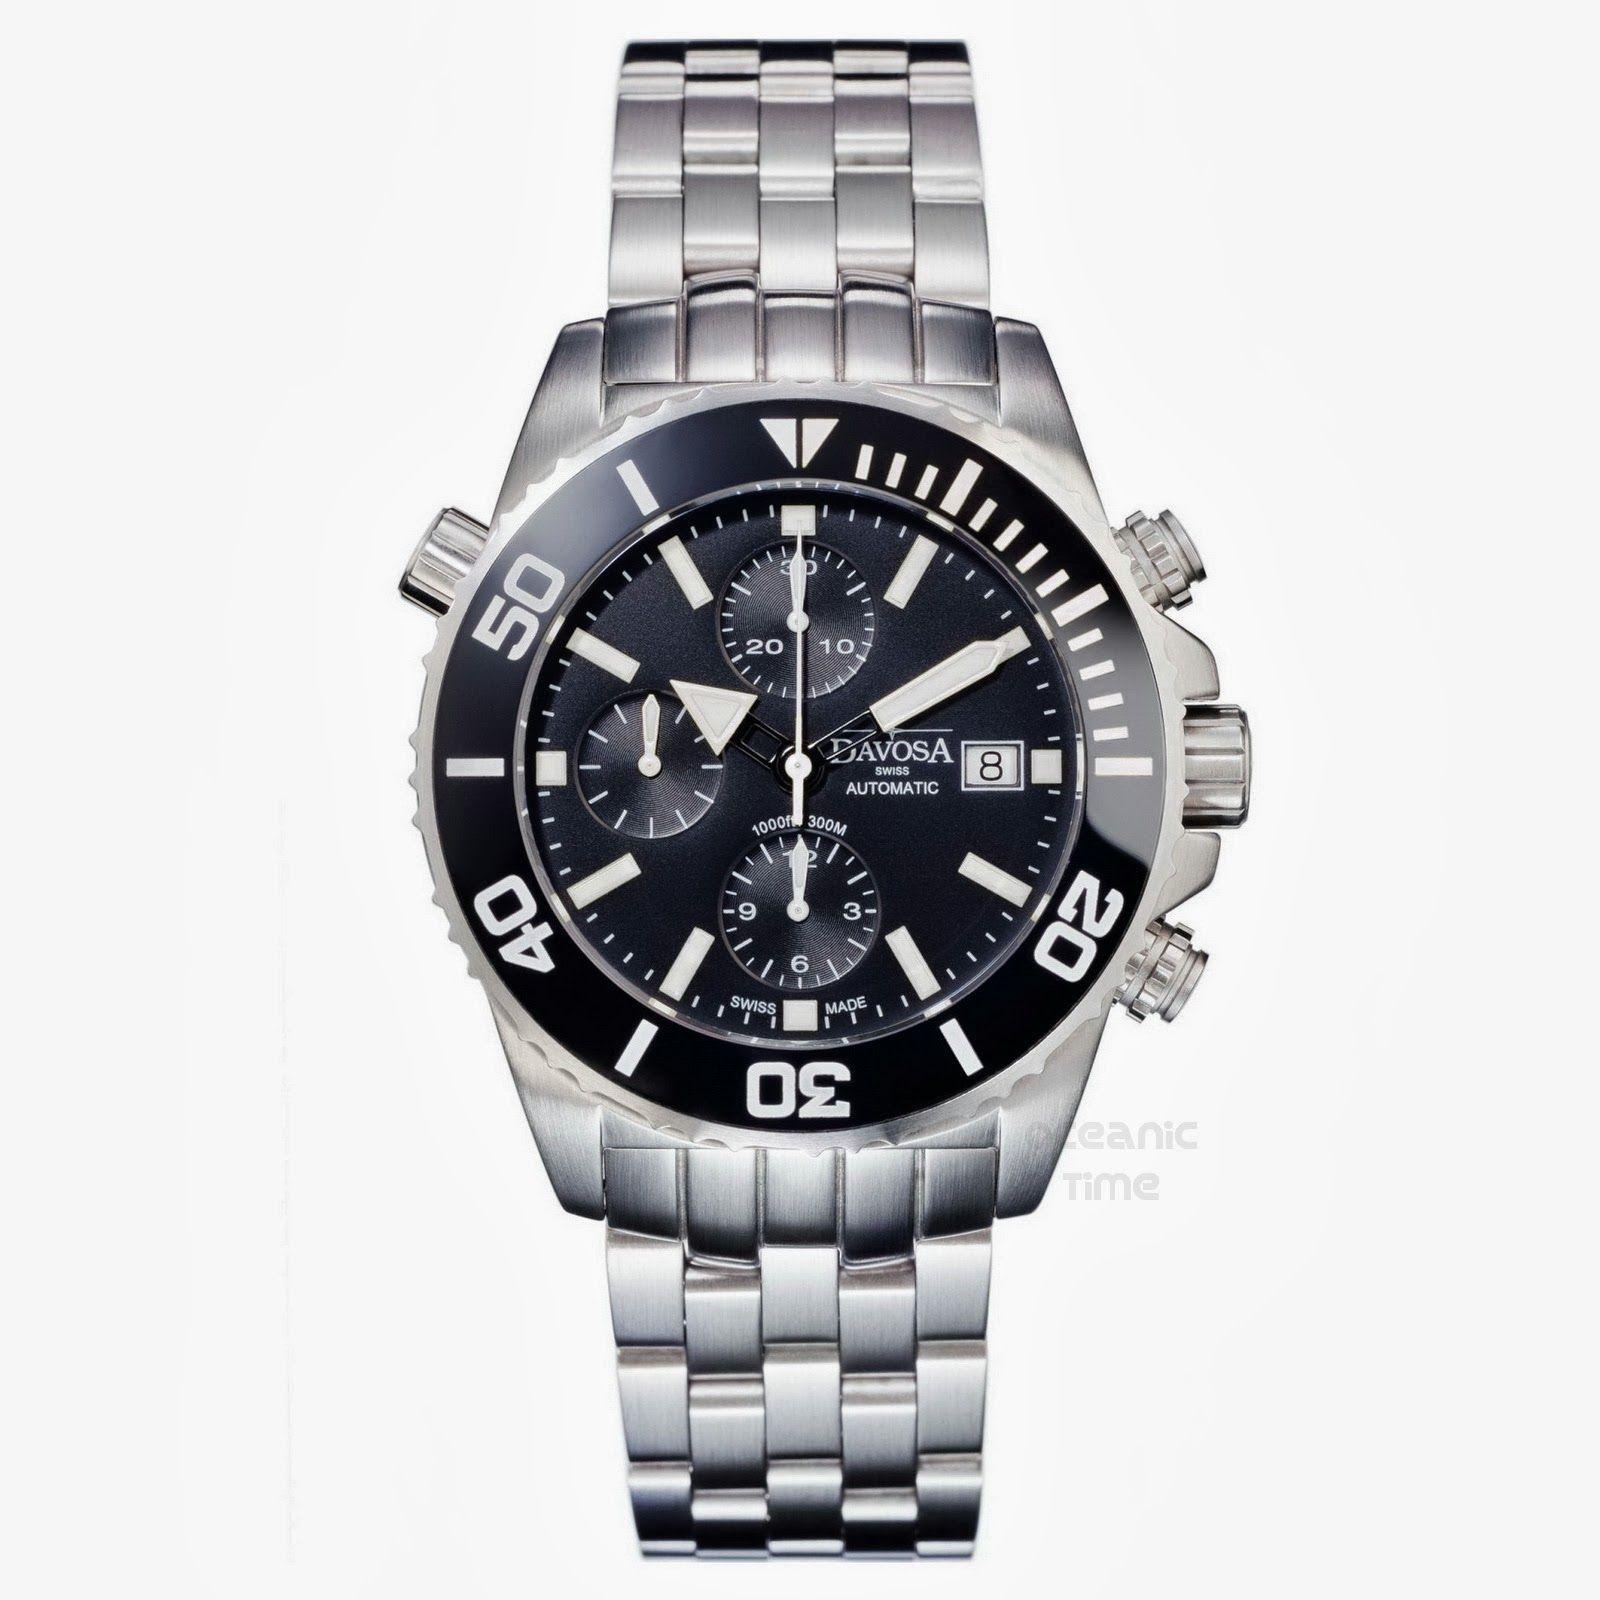 1d4d09b85bd OceanicTime  DAVOSA Argonautic Lumis CHRONO 2ndLOOK